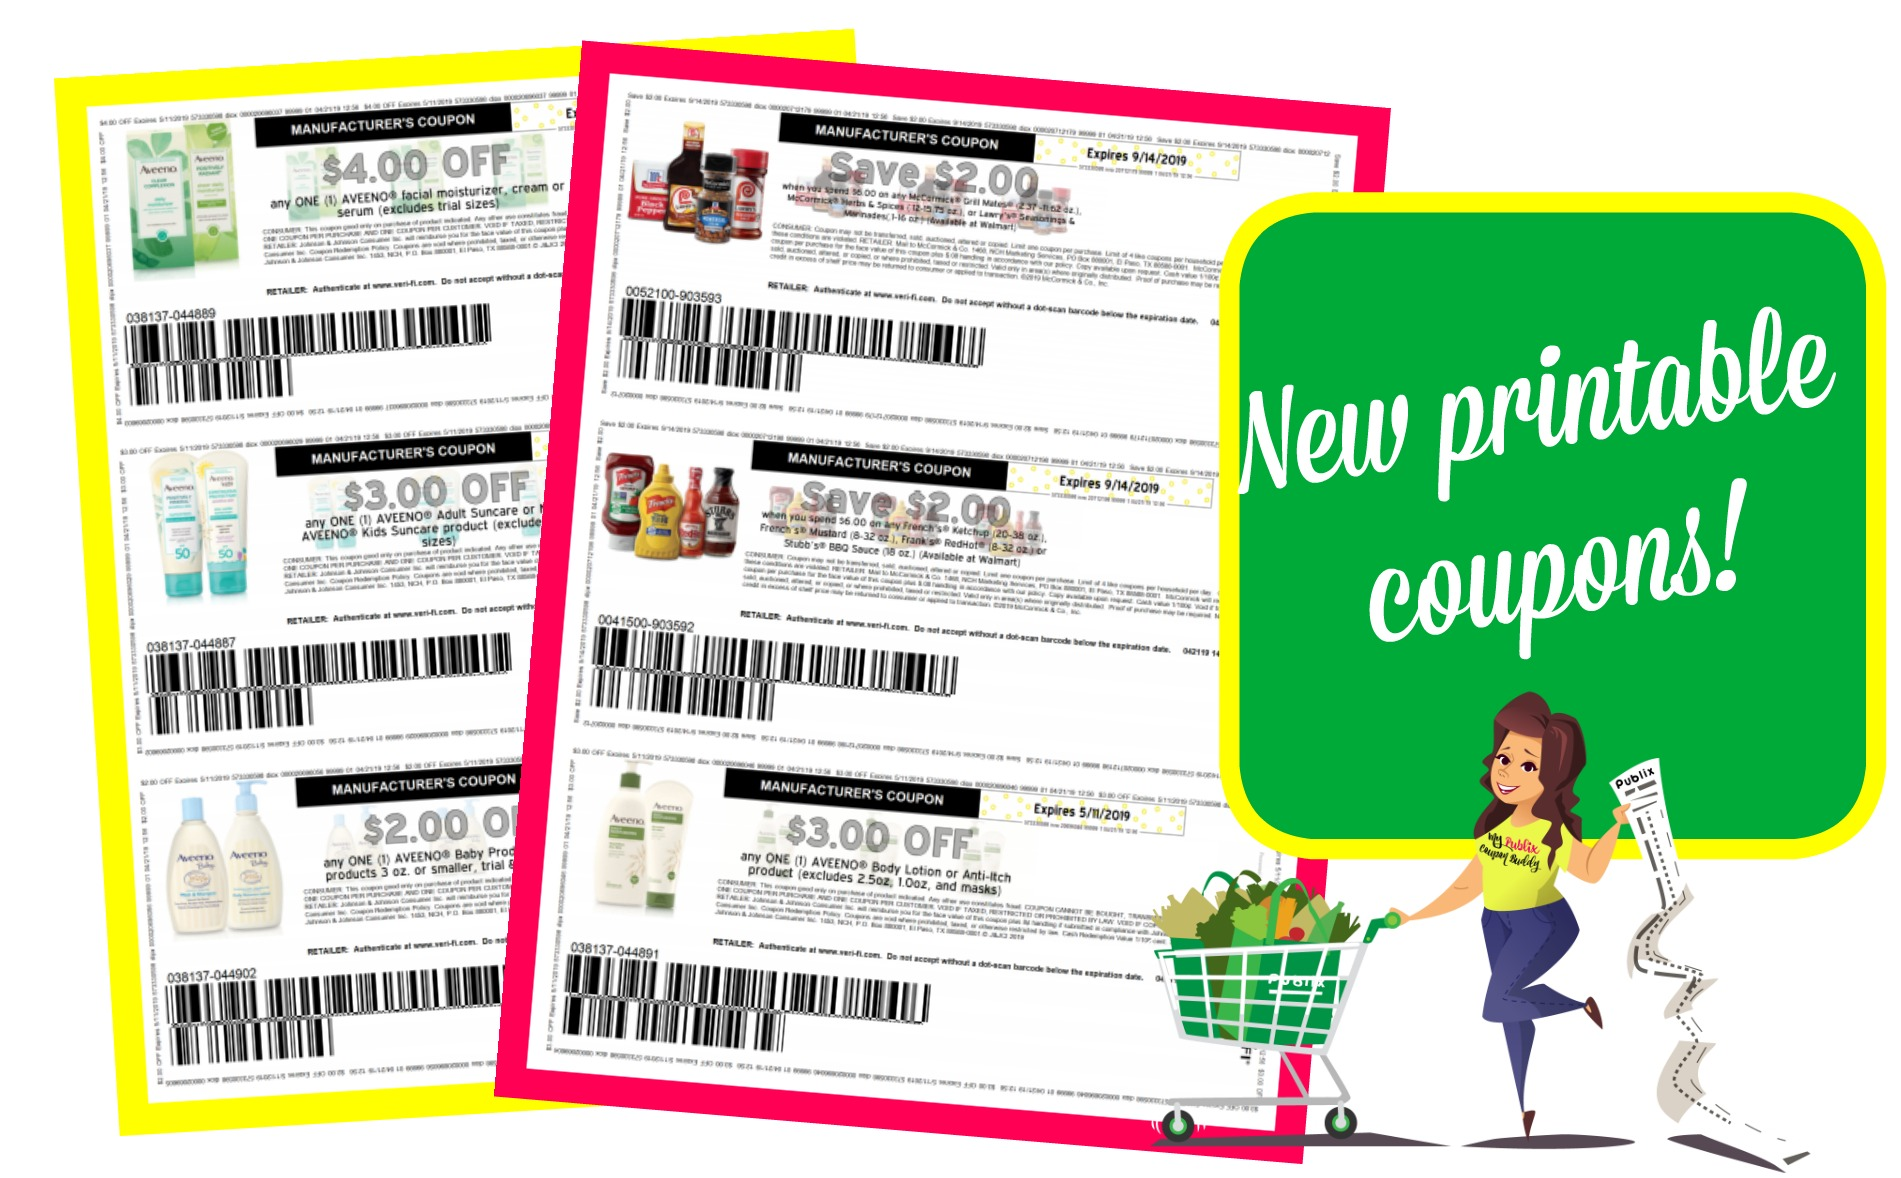 image regarding Aveeno Coupon Printable known as Wonderful fresh new printable discount coupons~ McCormick, Aveeno and even further